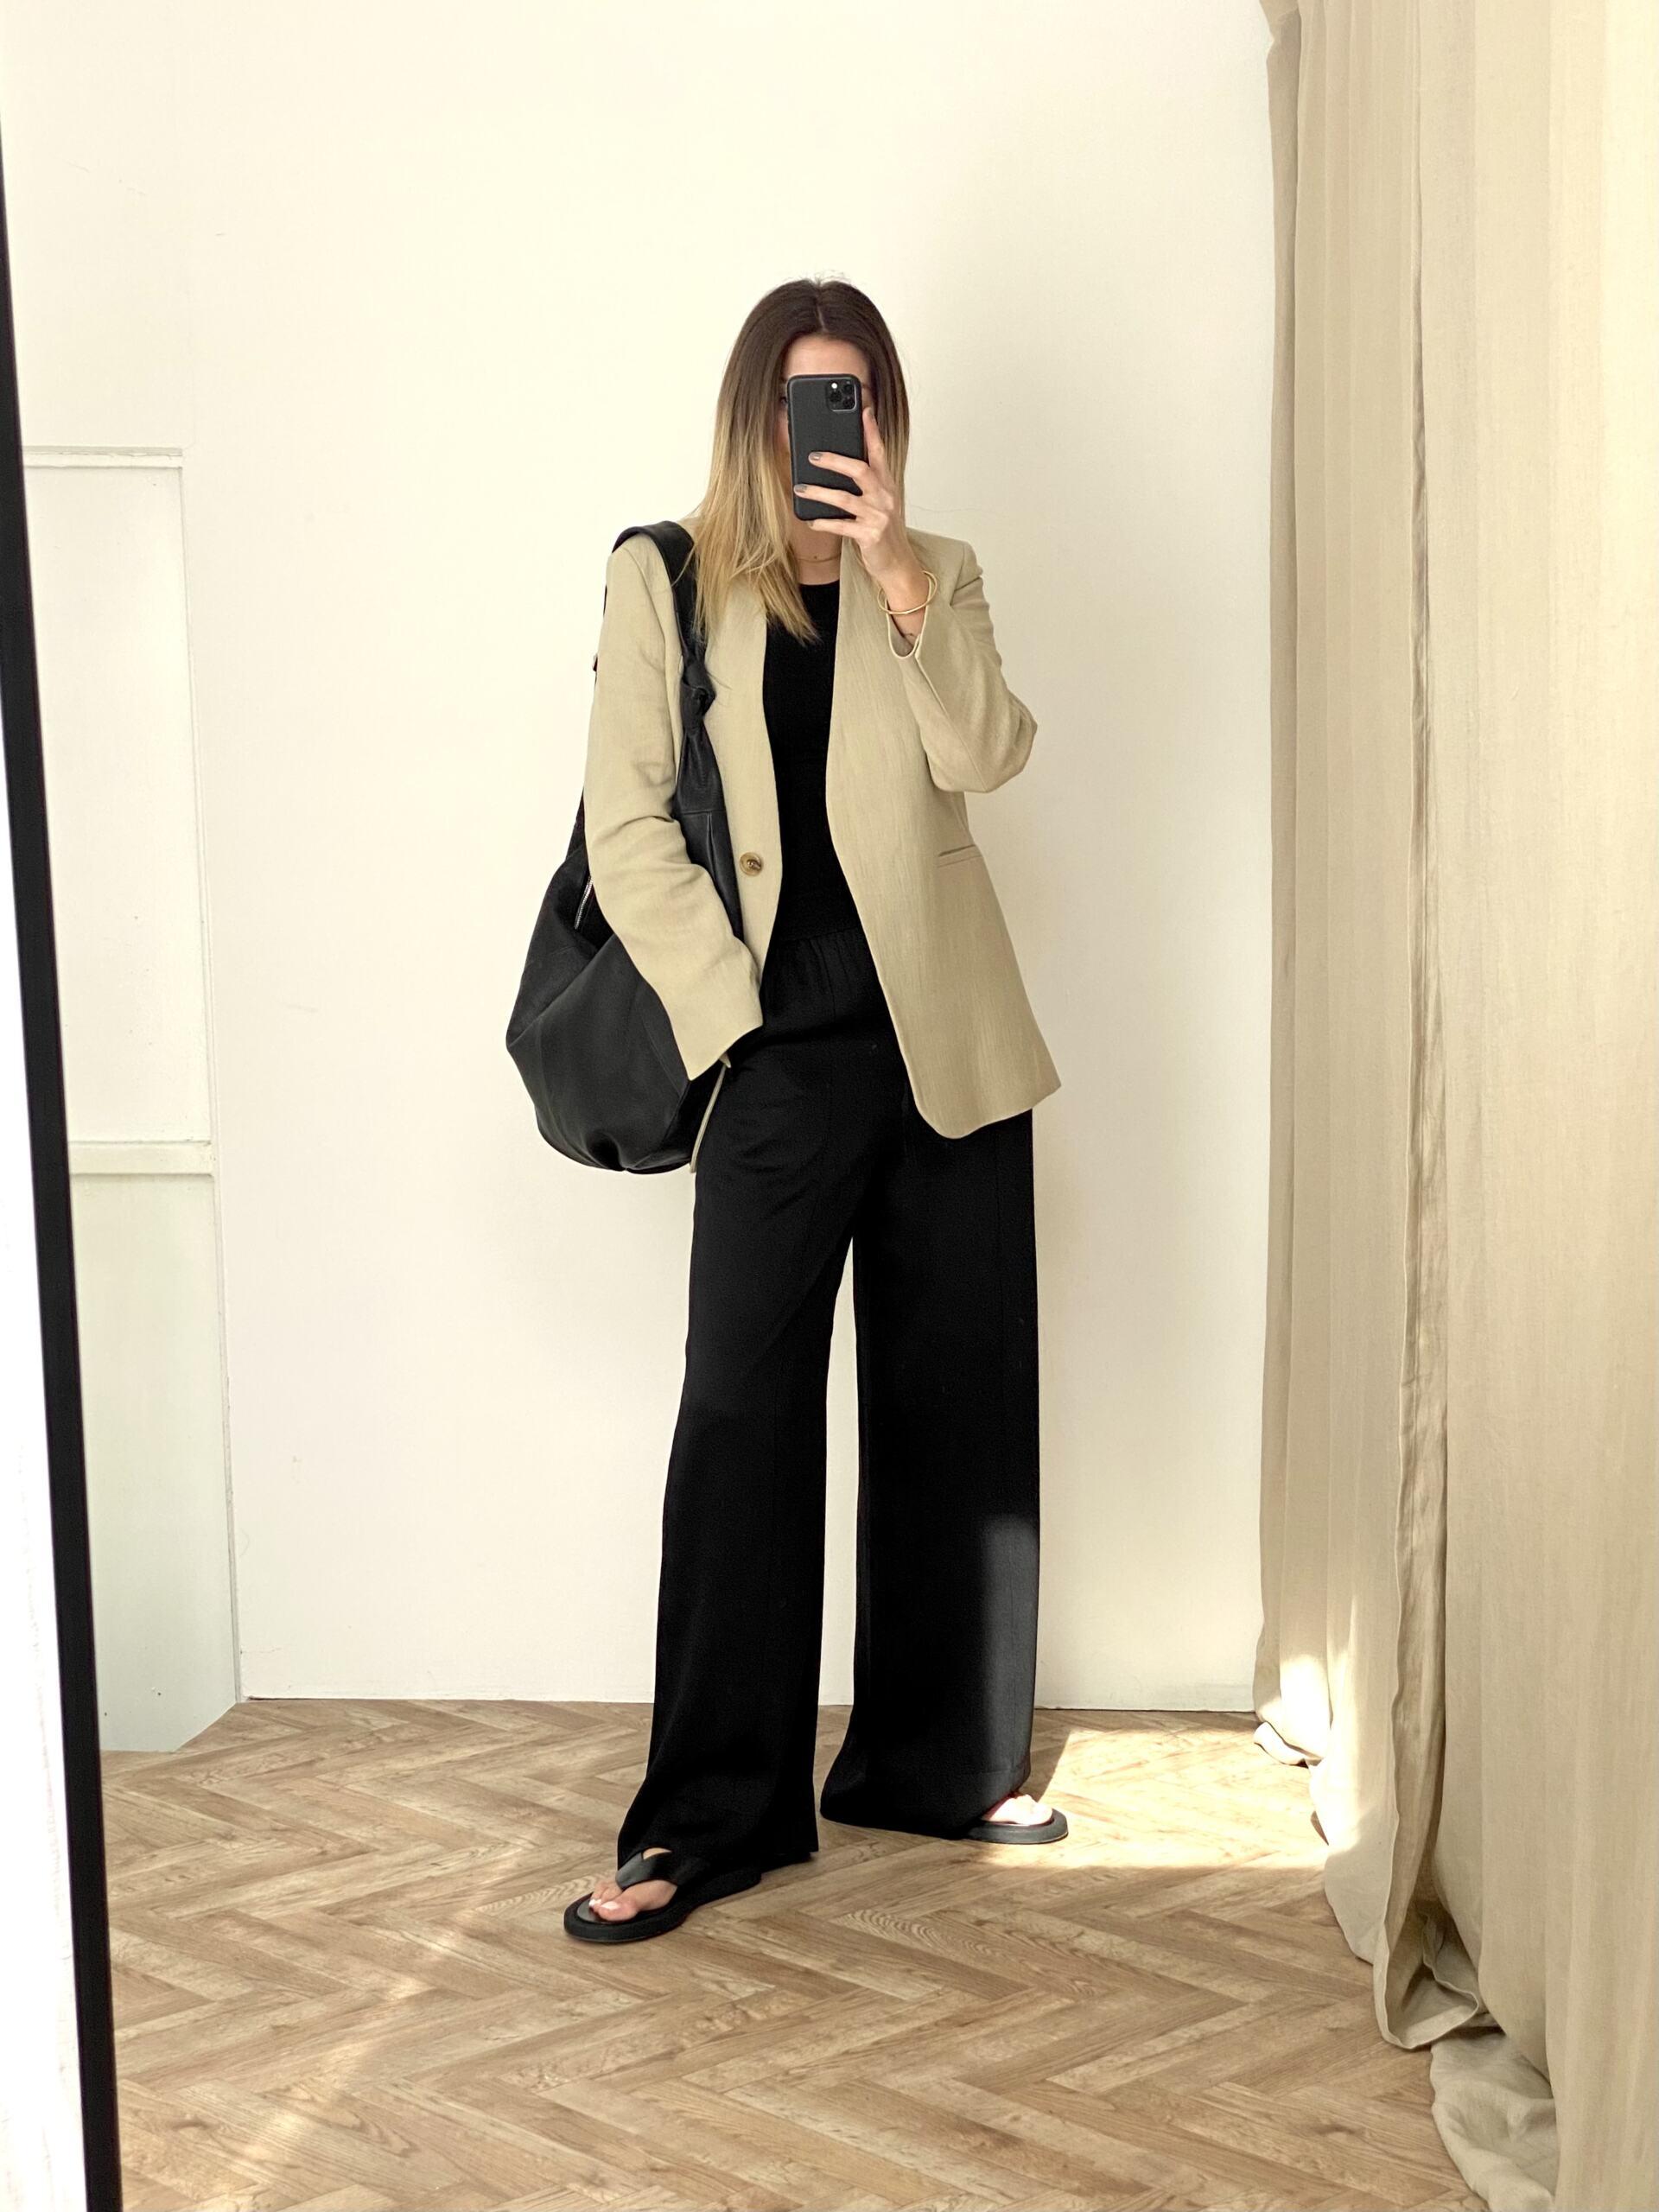 Emma Hill wears beige linen blazer, black wide leg trousers, thong flip flop black leather sandals, chic Spring outfit